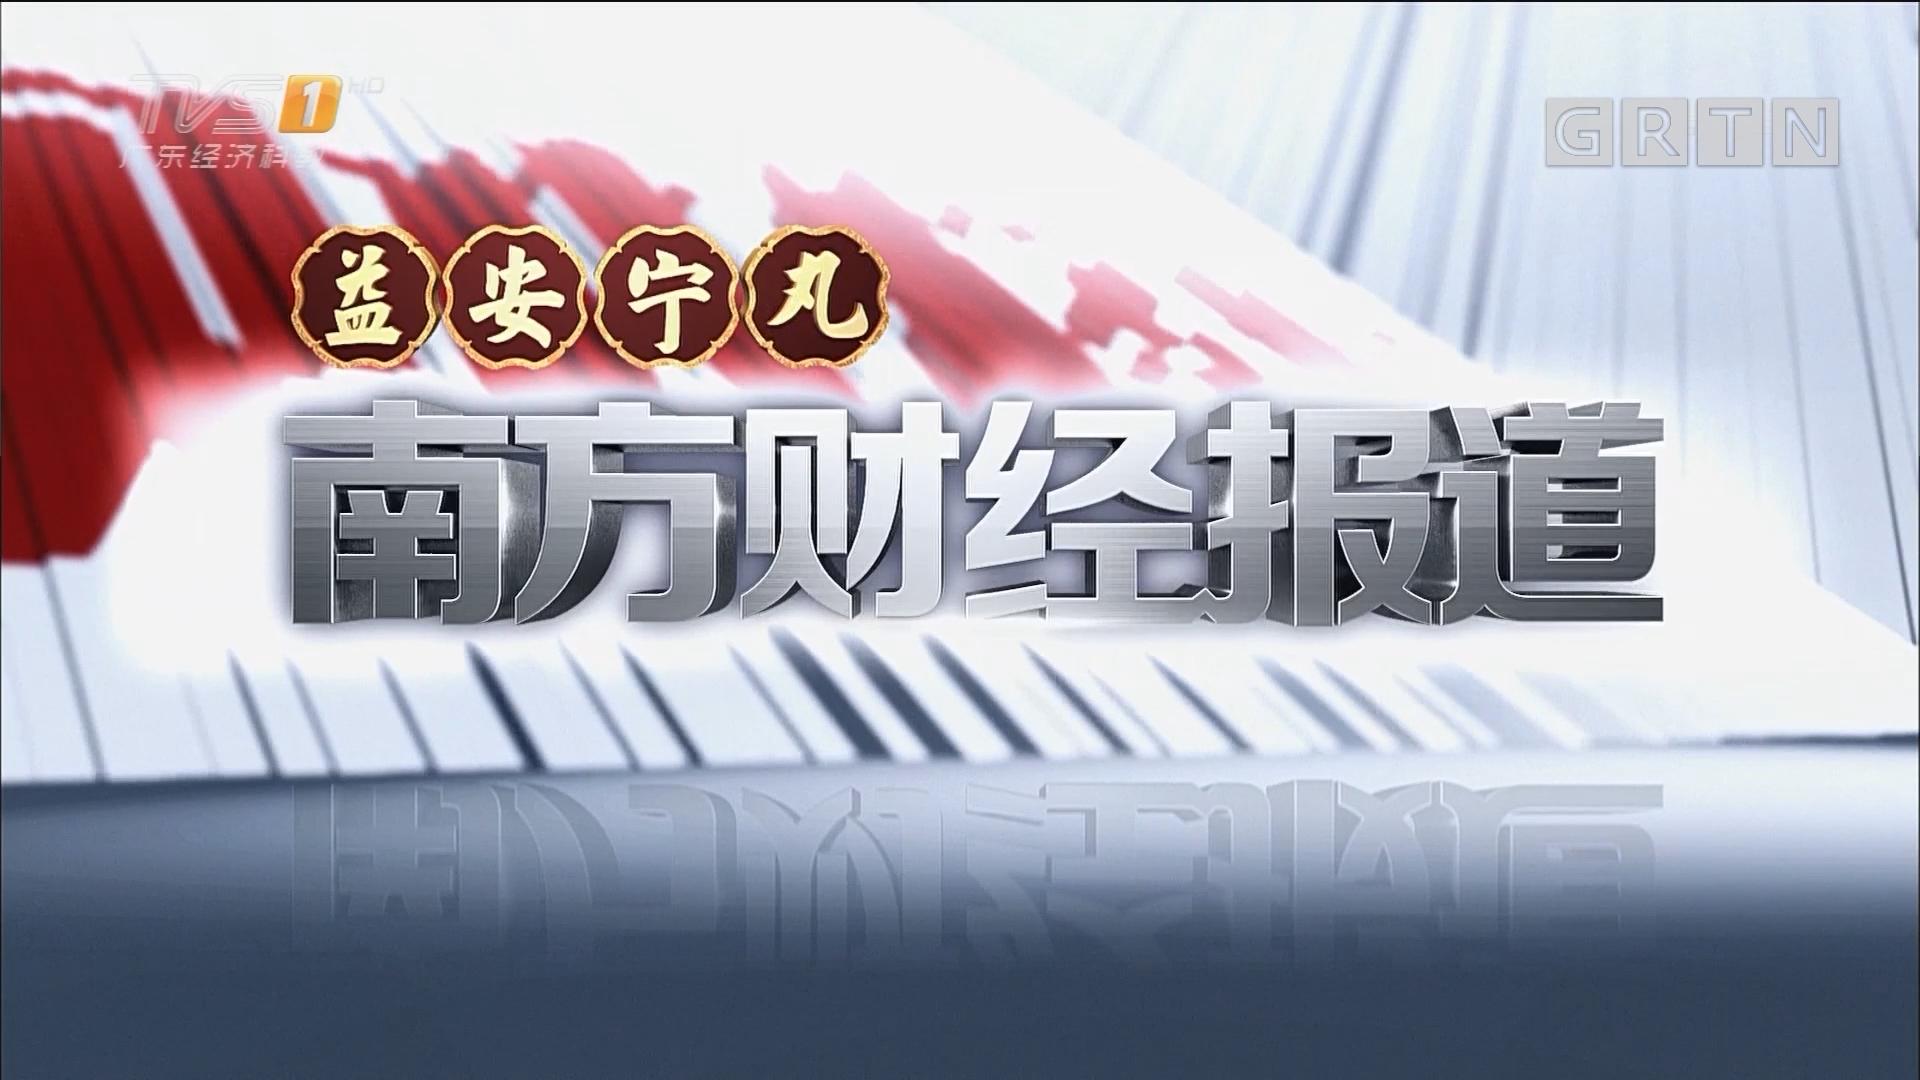 [HD][2017-11-12]南方财经报道:2539亿元!双十一破新纪录!广东冲上榜首